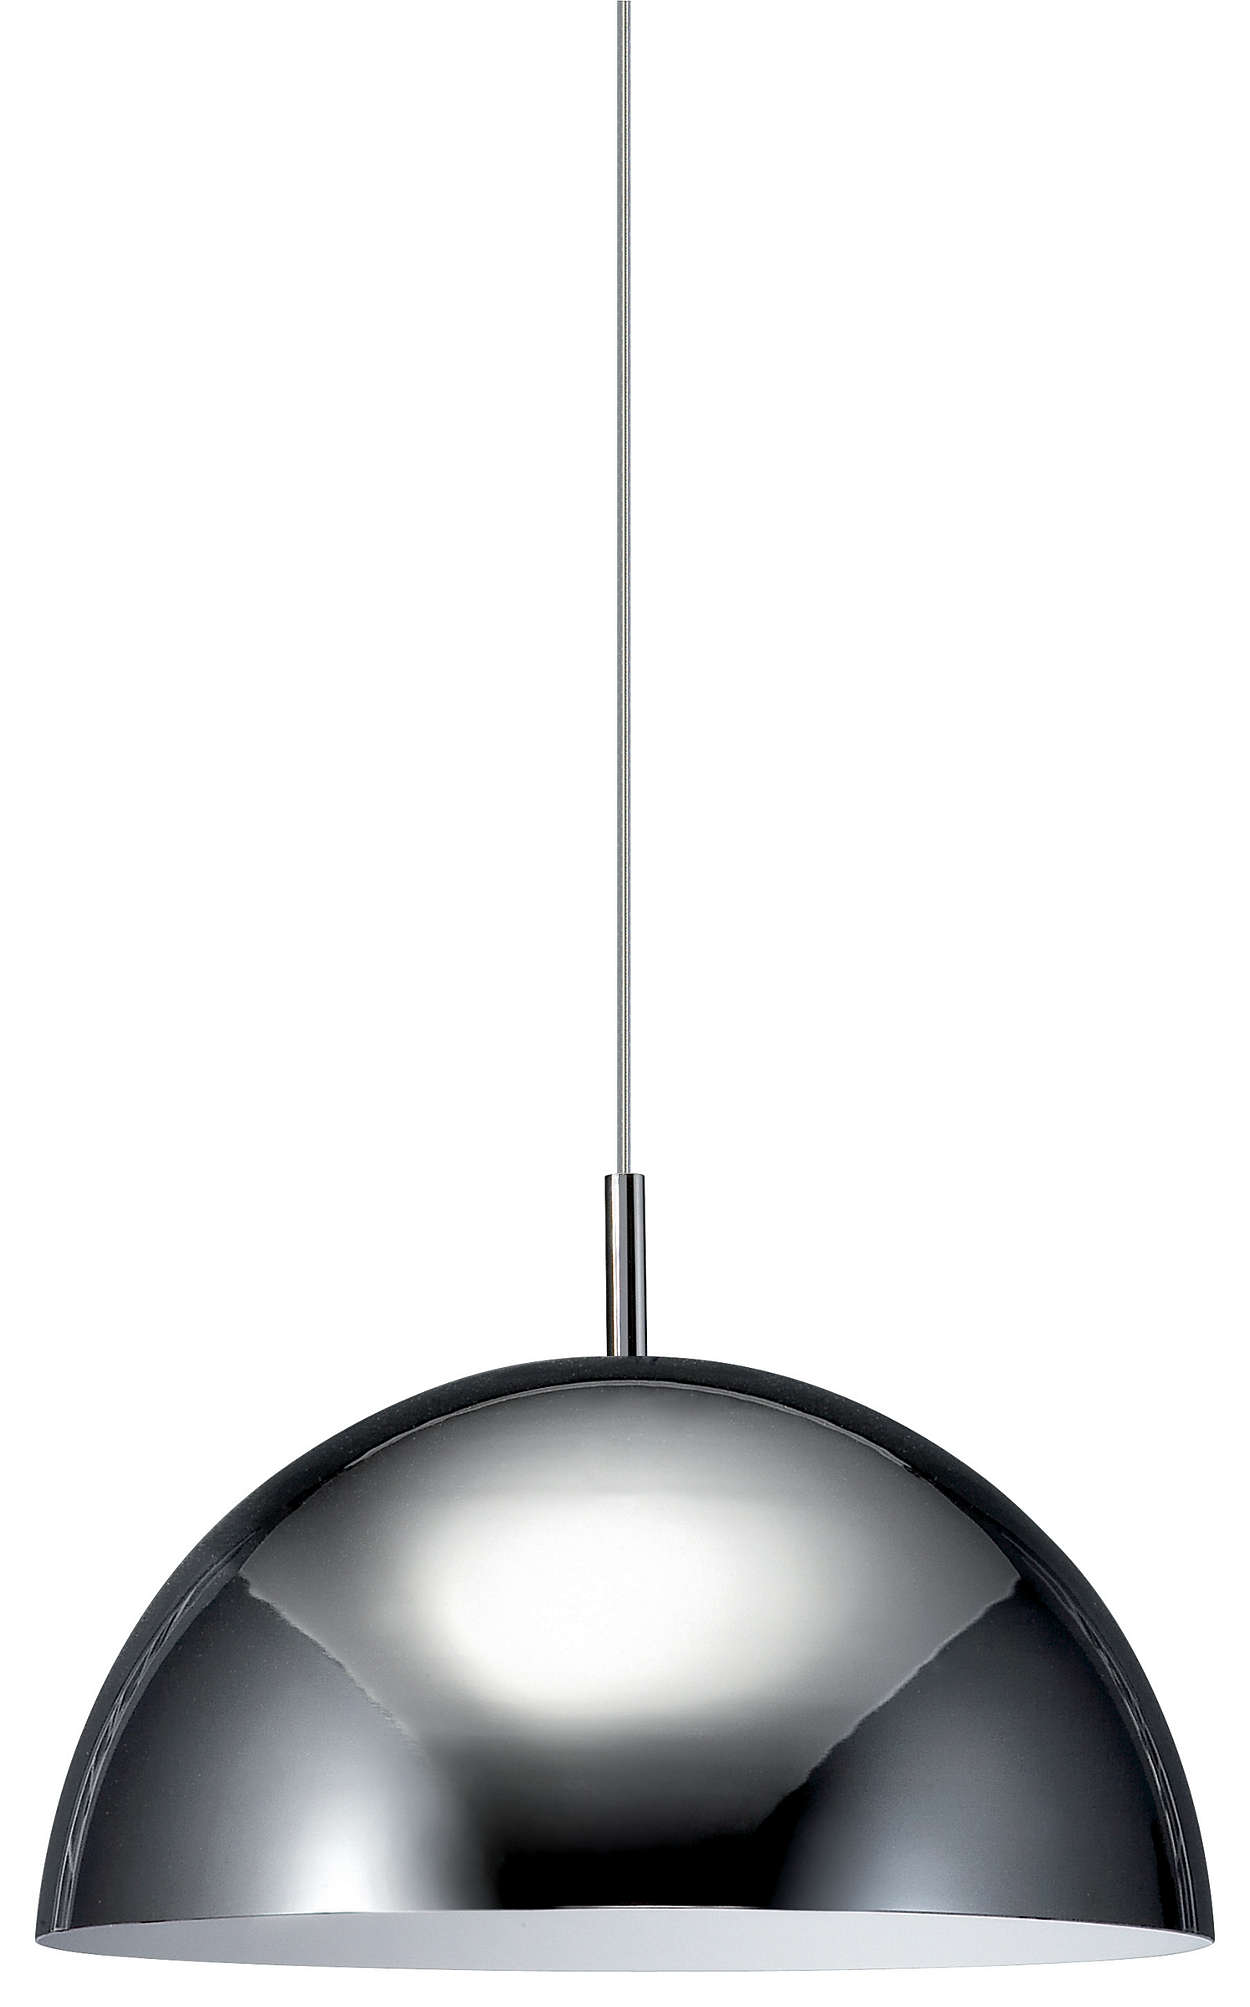 Suspension light 402281148 forecast dome 1 light pendant in chrome finish arubaitofo Gallery